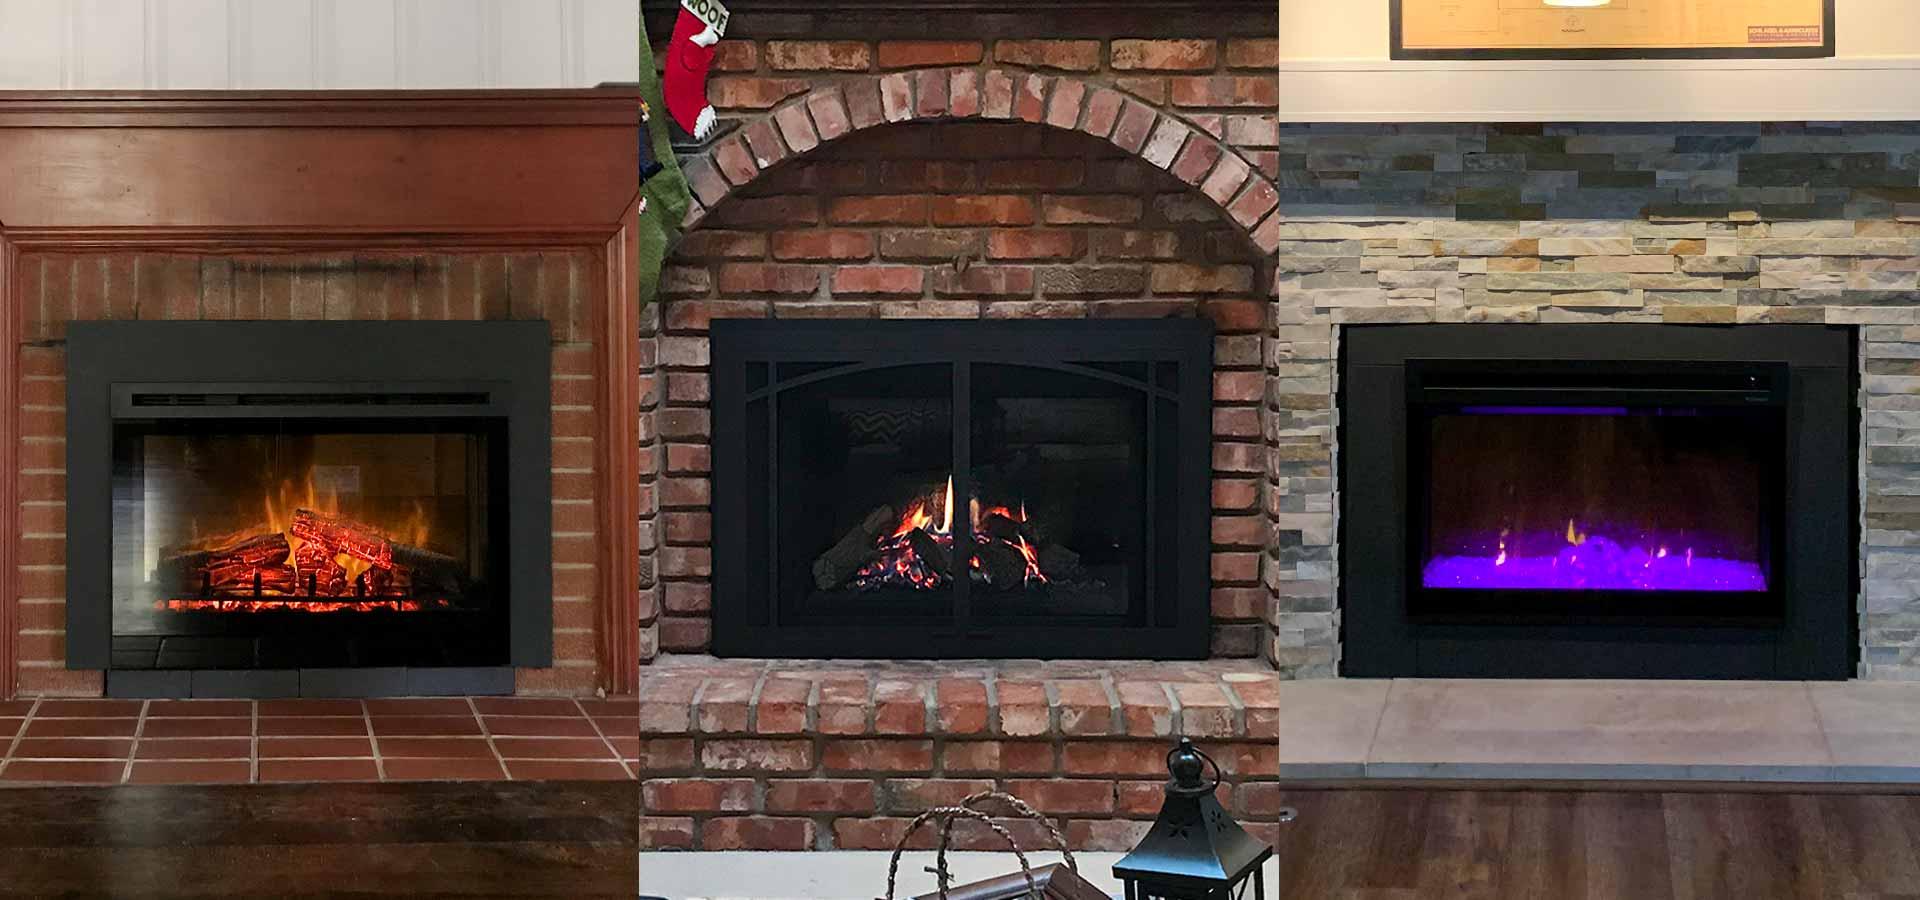 3 Types of Chimneys Masonry, Wood Stove, and Prefab with Siding